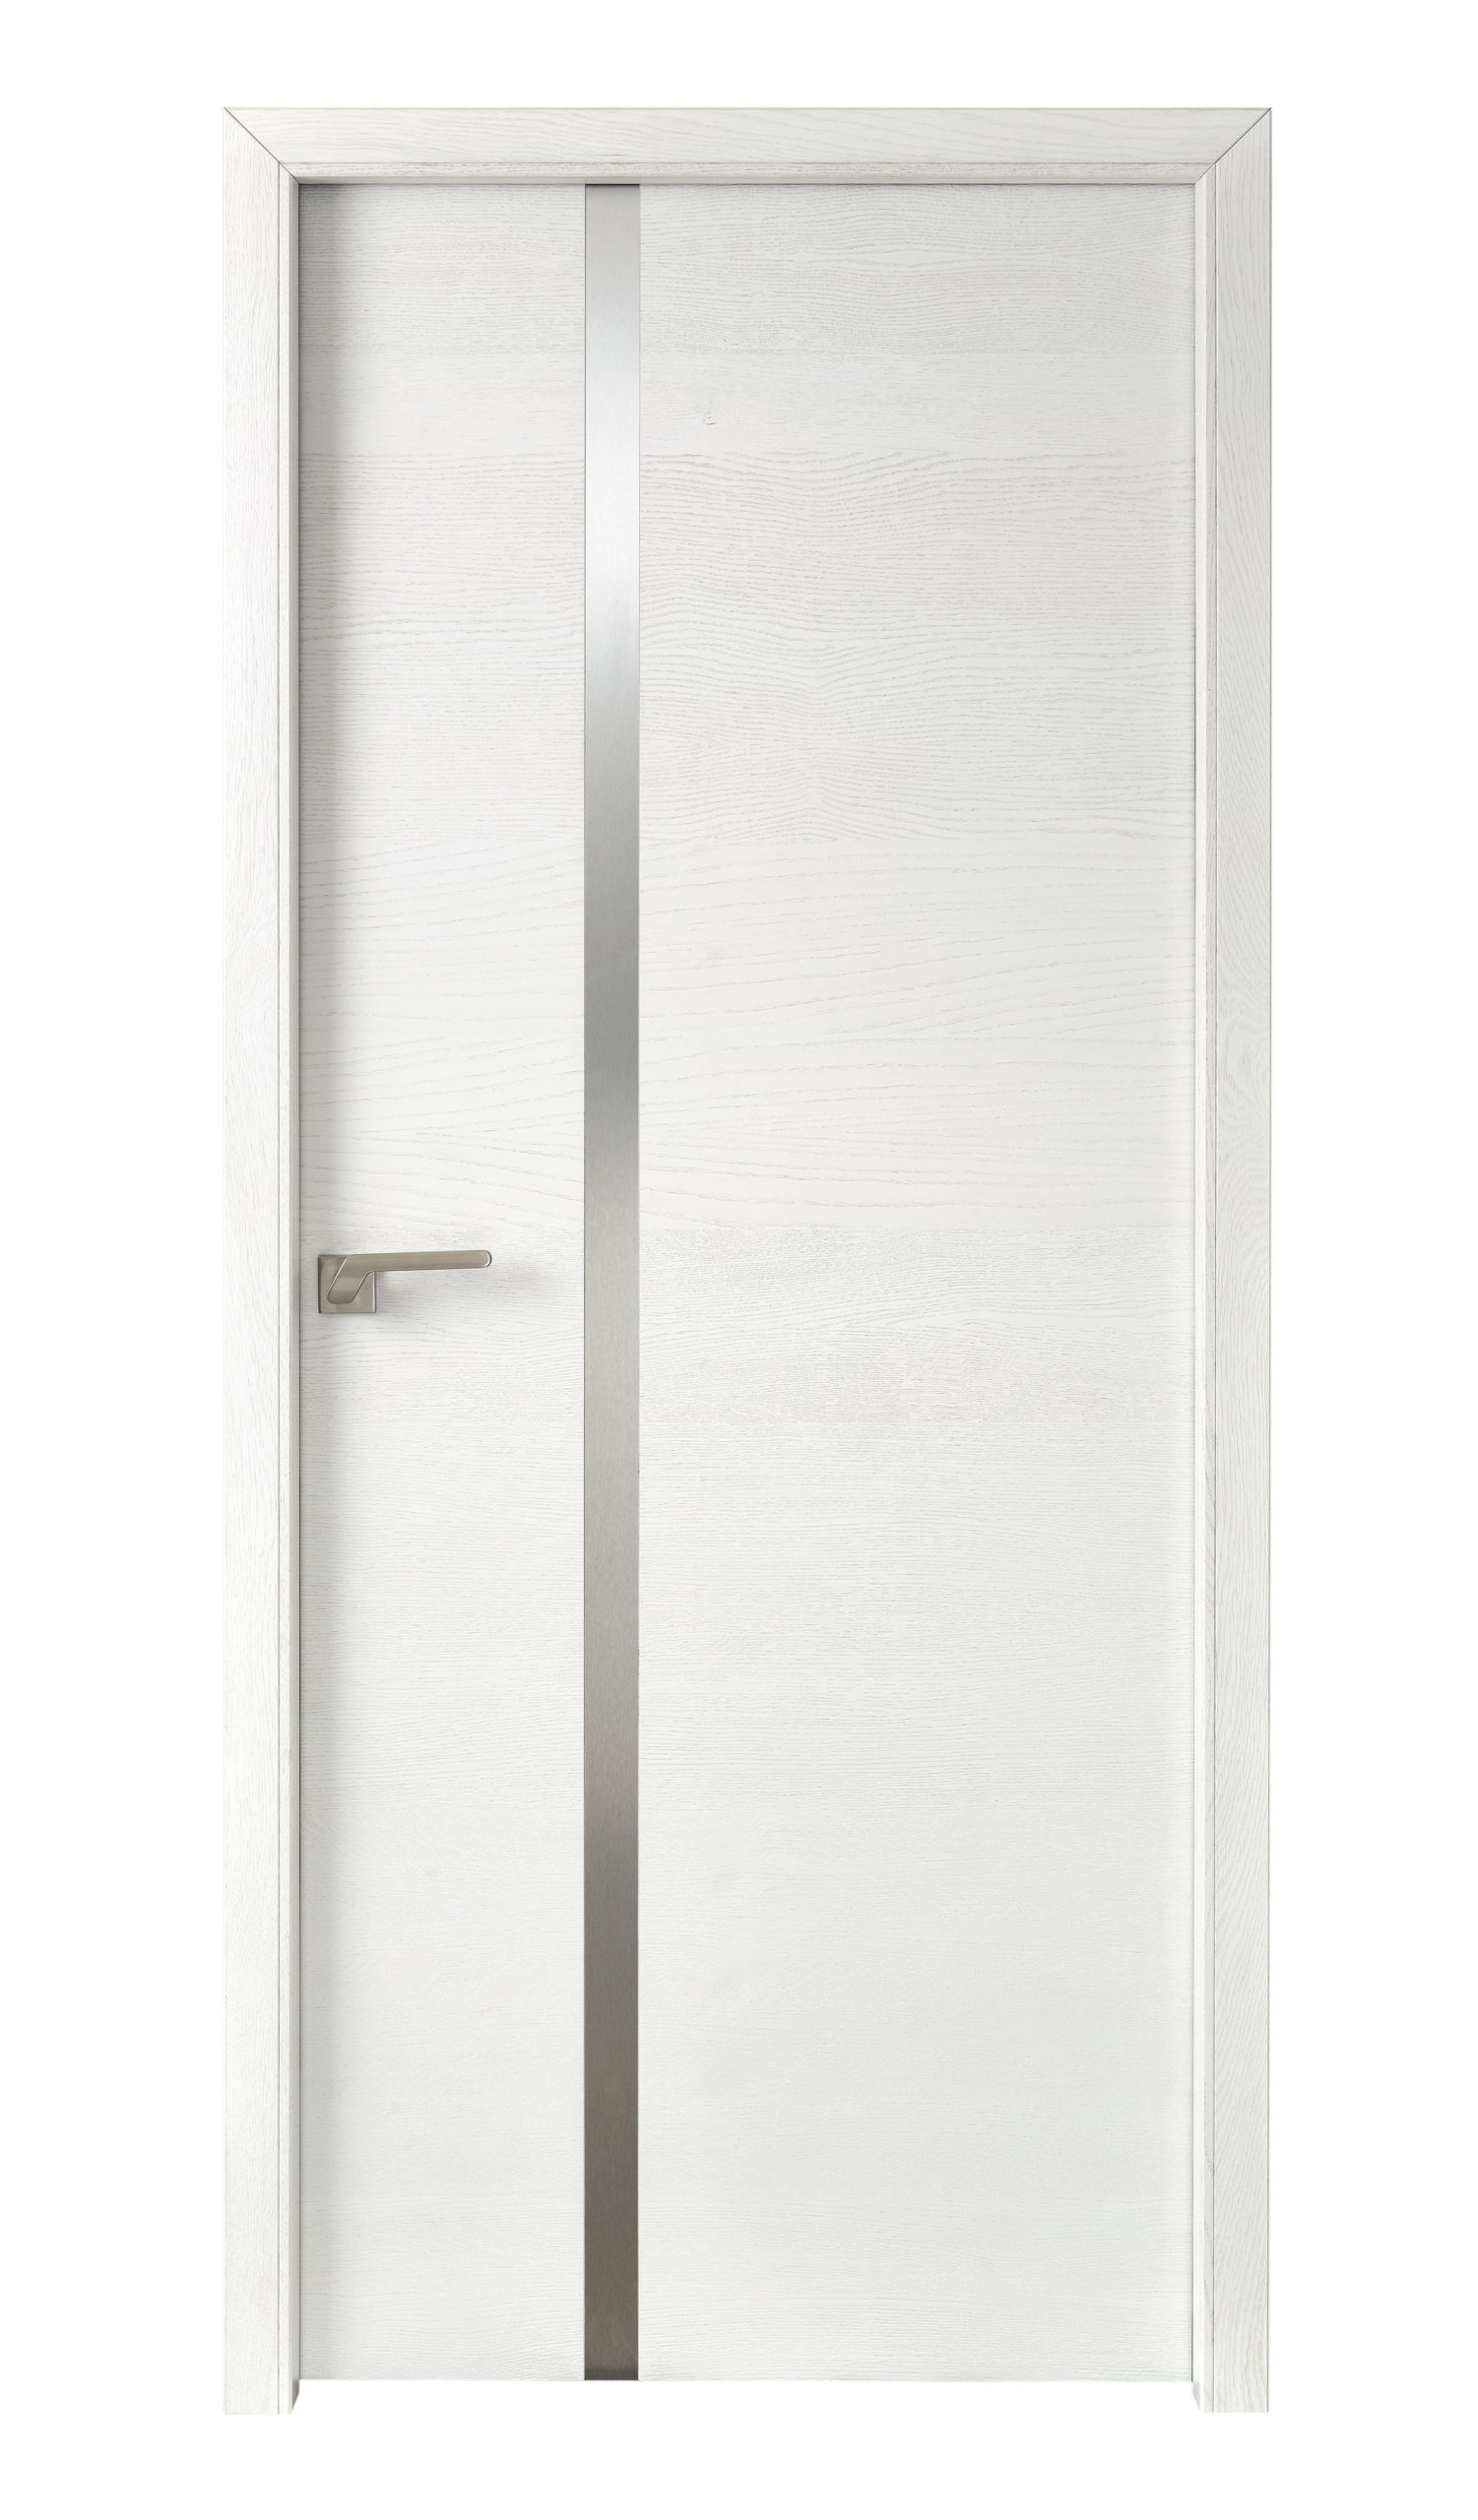 Porte d'intérieur Signature inox